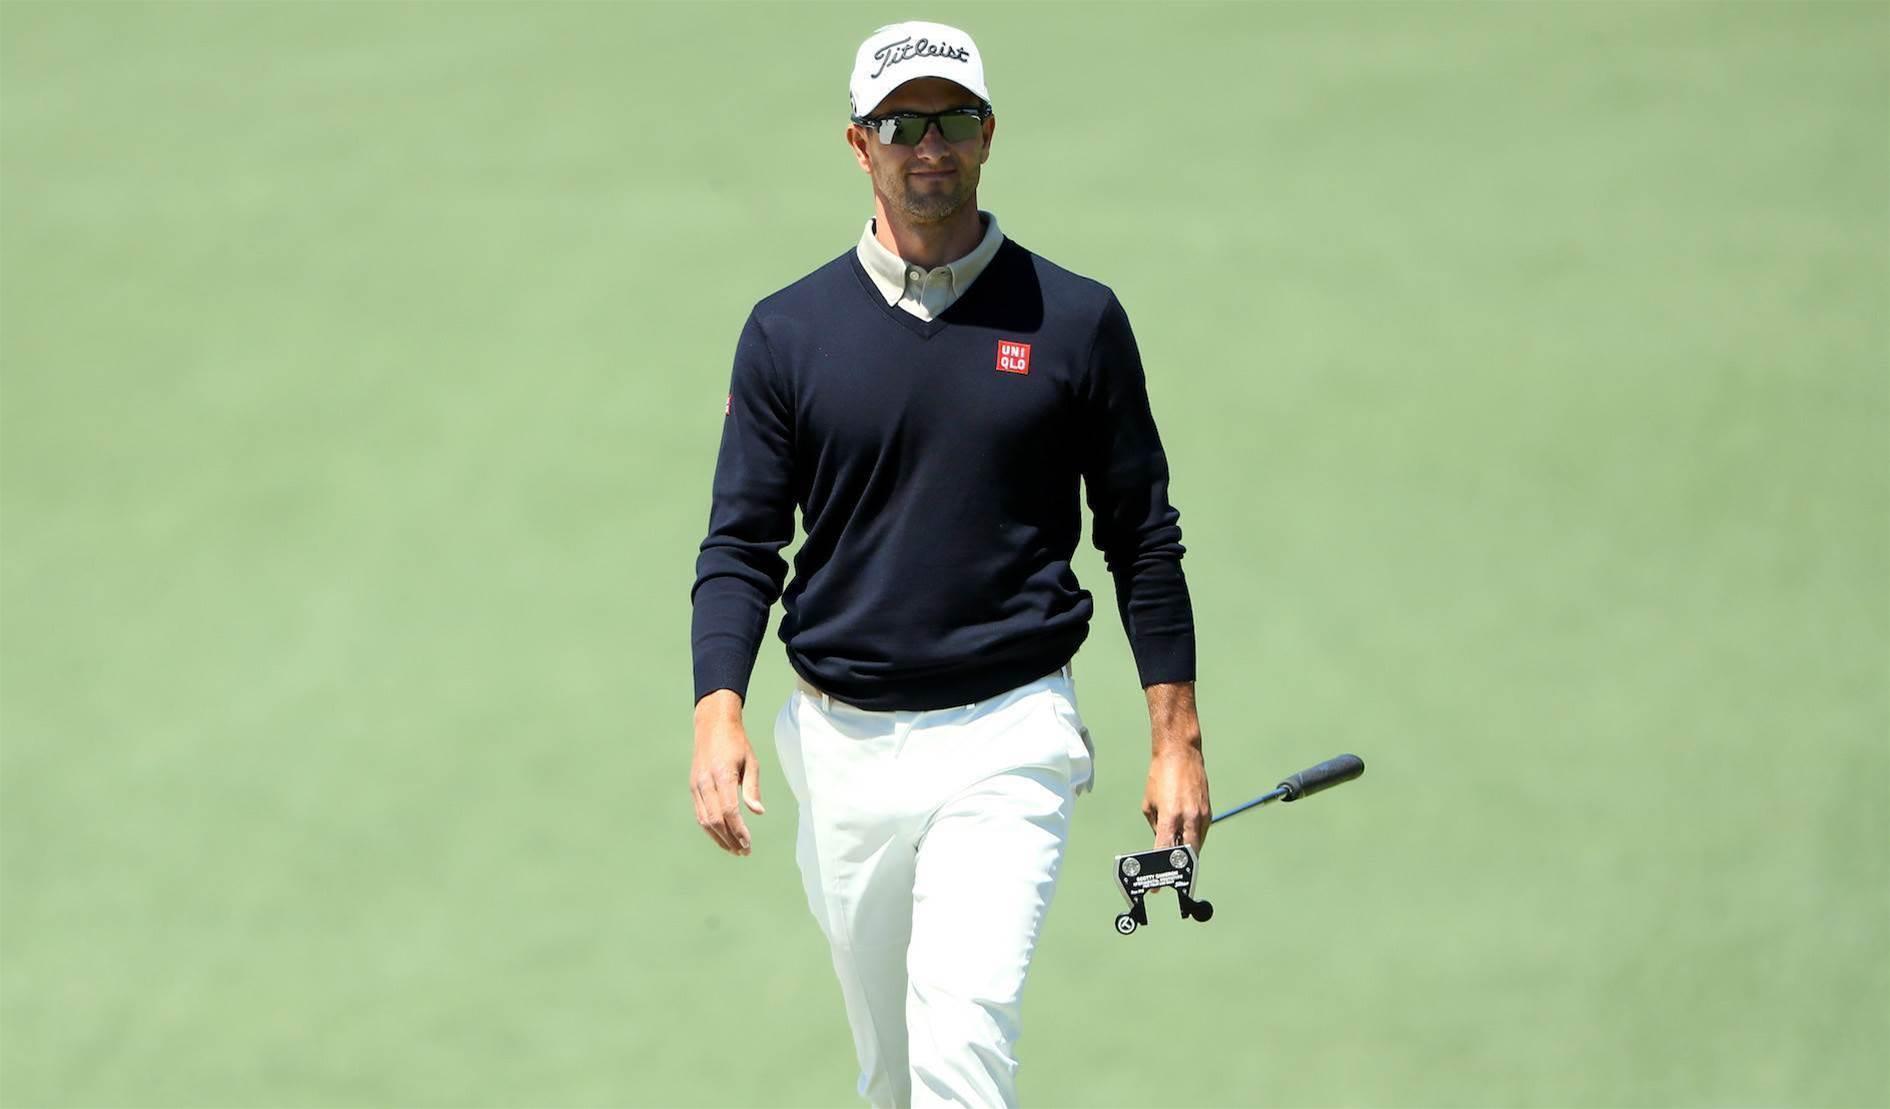 MASTERS: Scott edges closer to lead